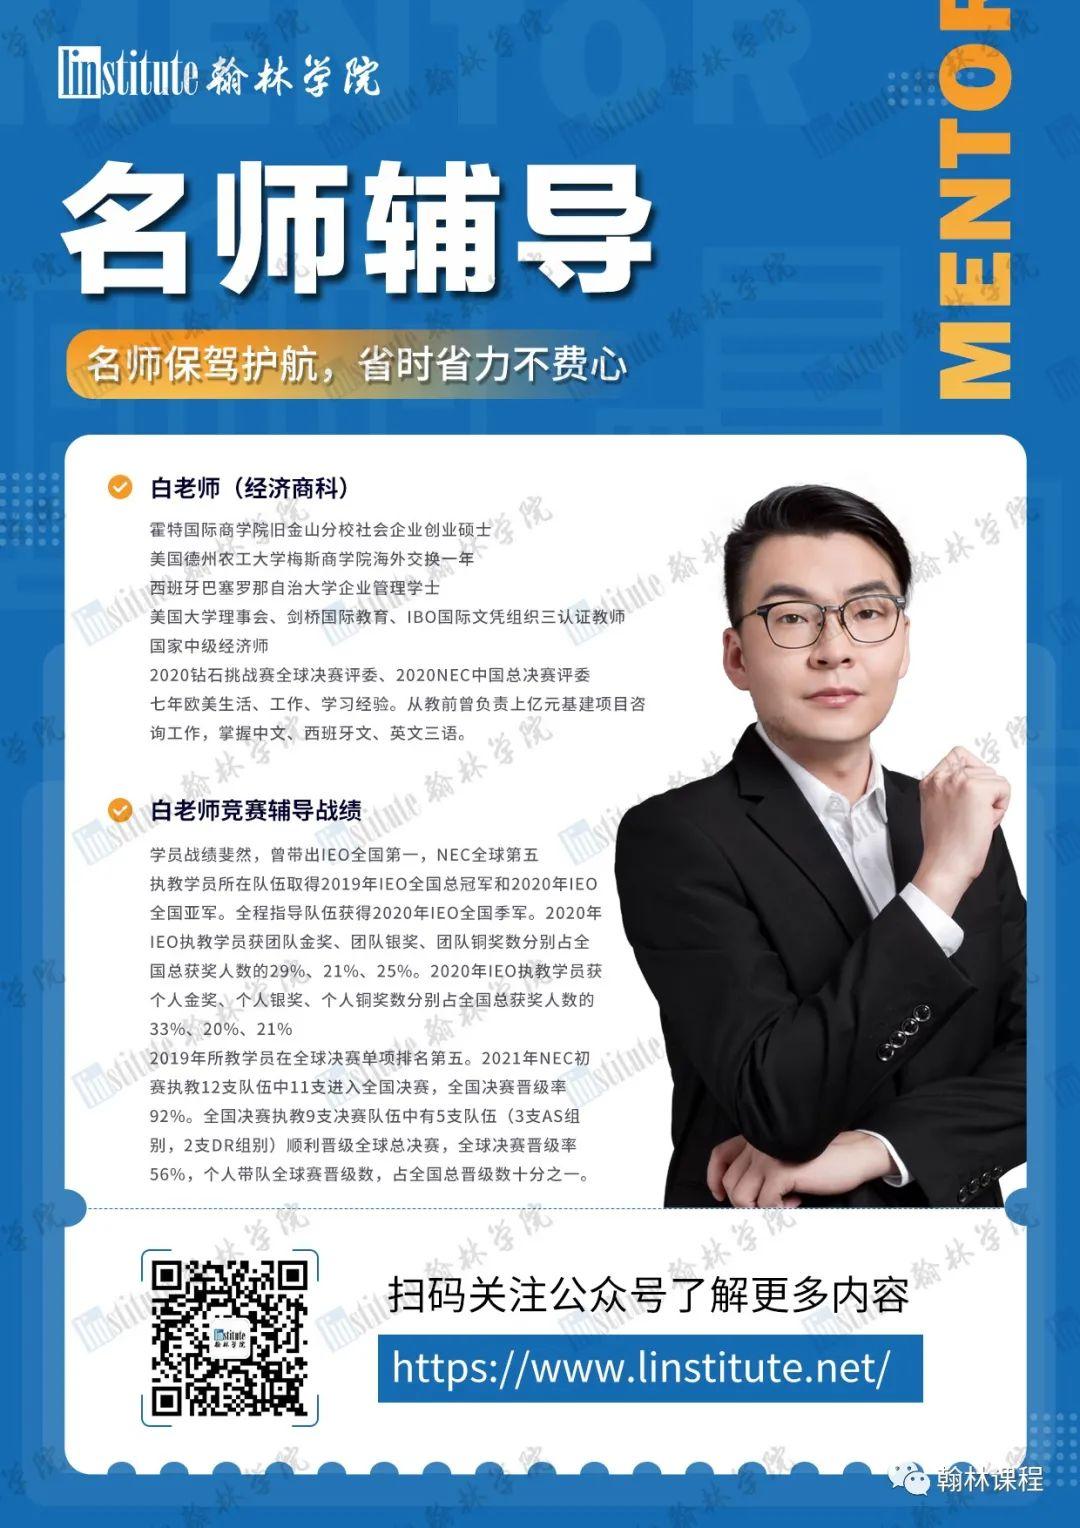 NEC全美经济学挑战全球站即将开赛!如何冲击全球TOP1?